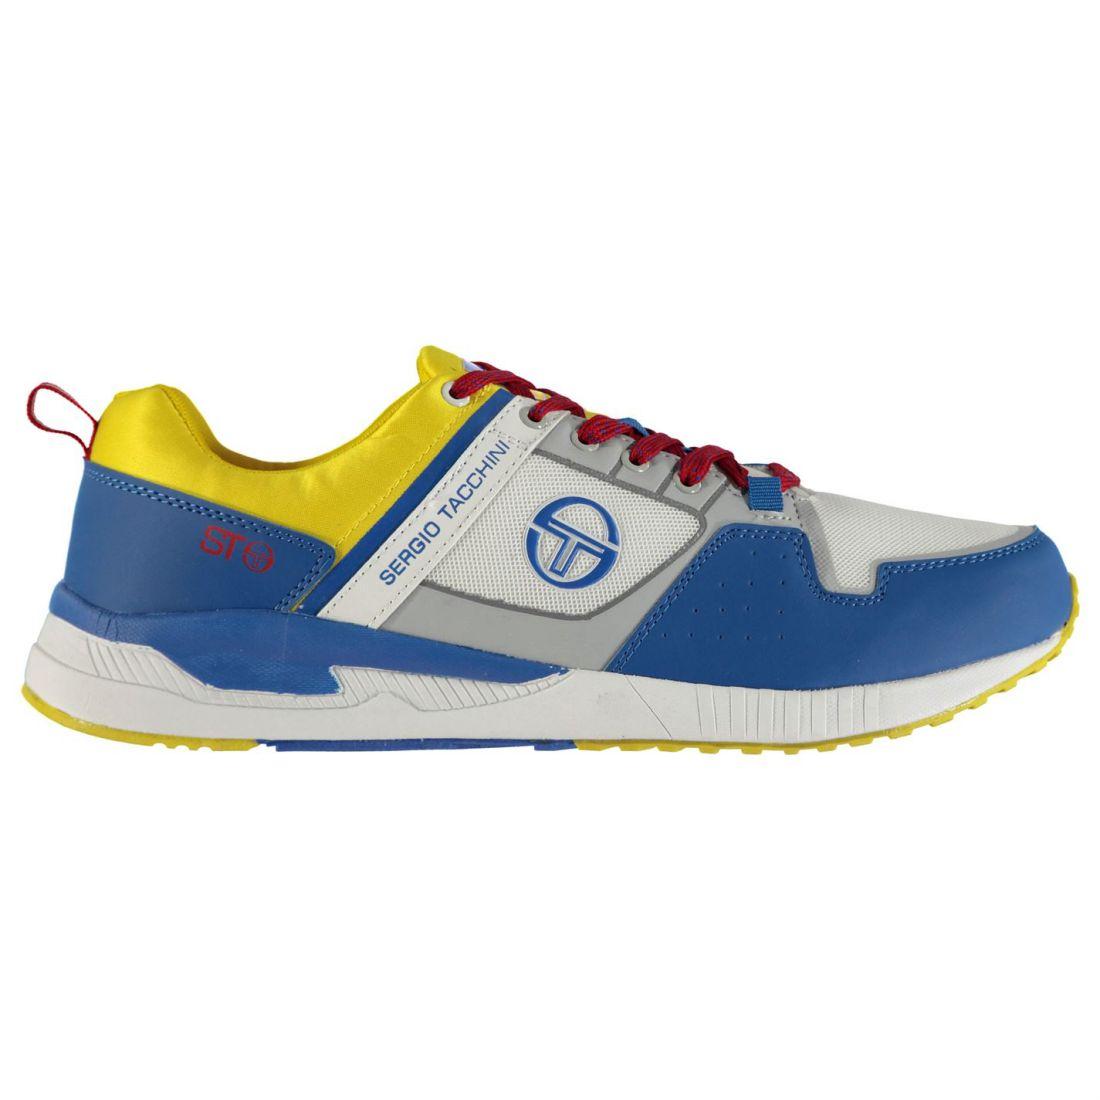 e682f0c09d Image is loading Sergio-Tacchini-Zeus-Sneakers-Mens-Gents-Classic